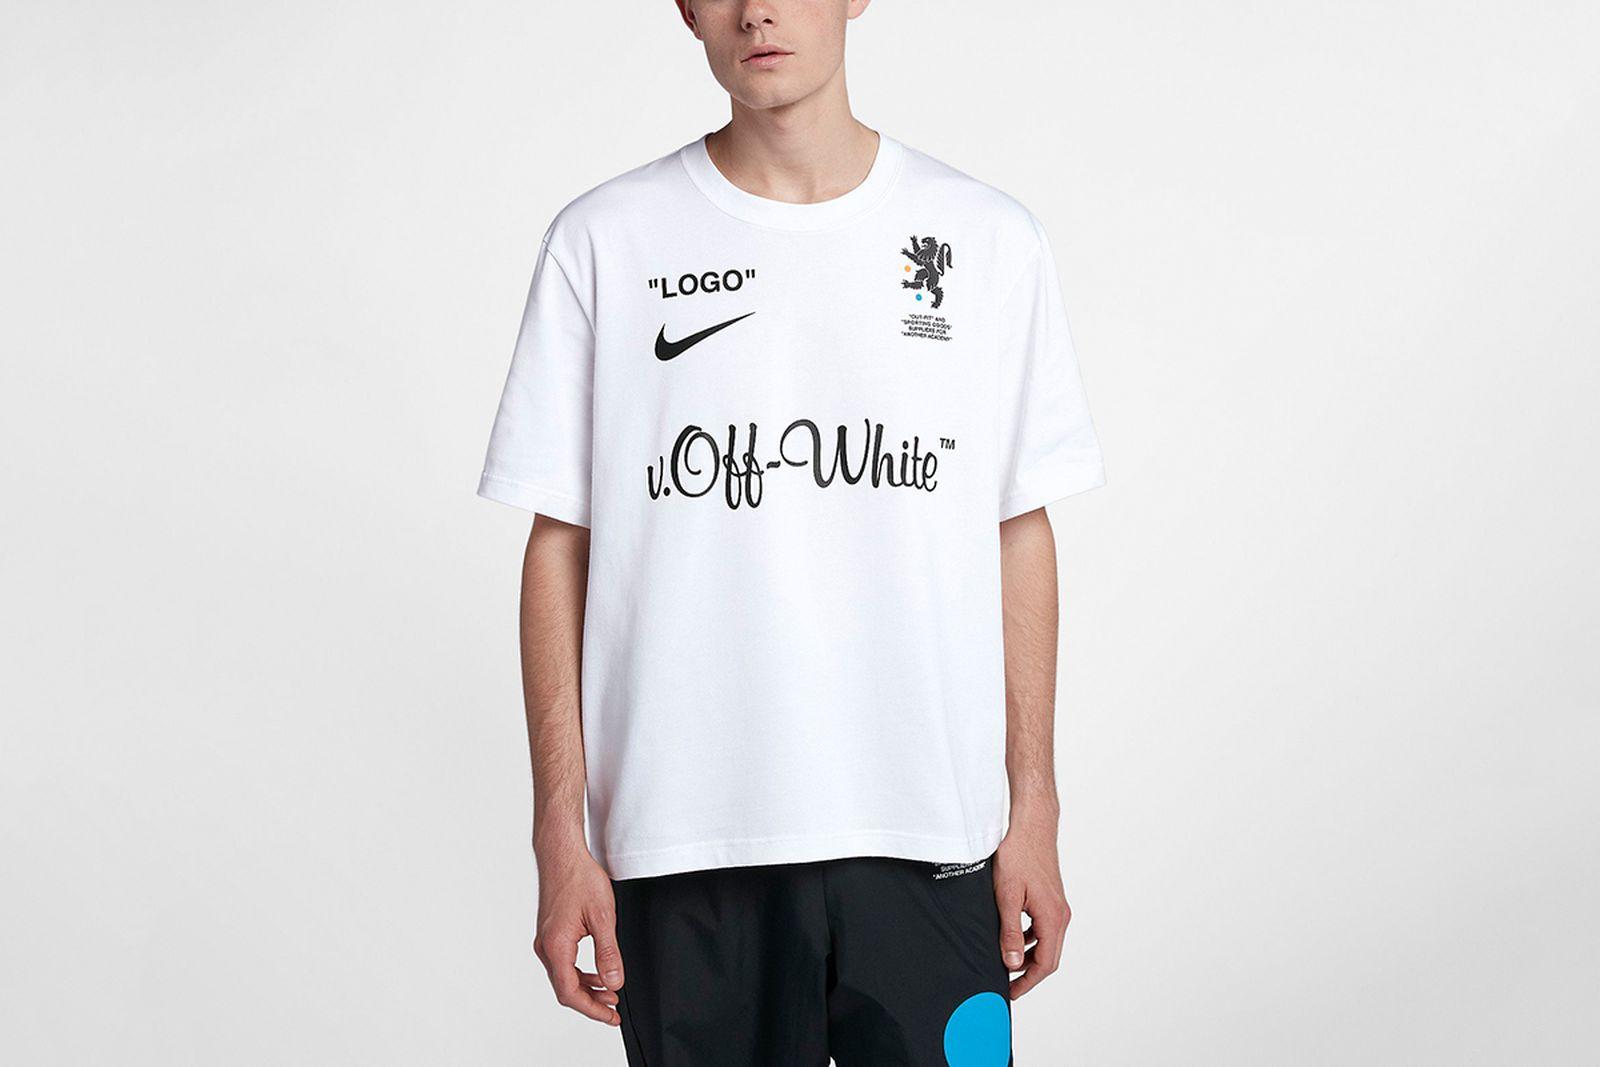 t shirt 2018 FIFA World Cup Nike OFF-WHITE c/o Virgil Abloh